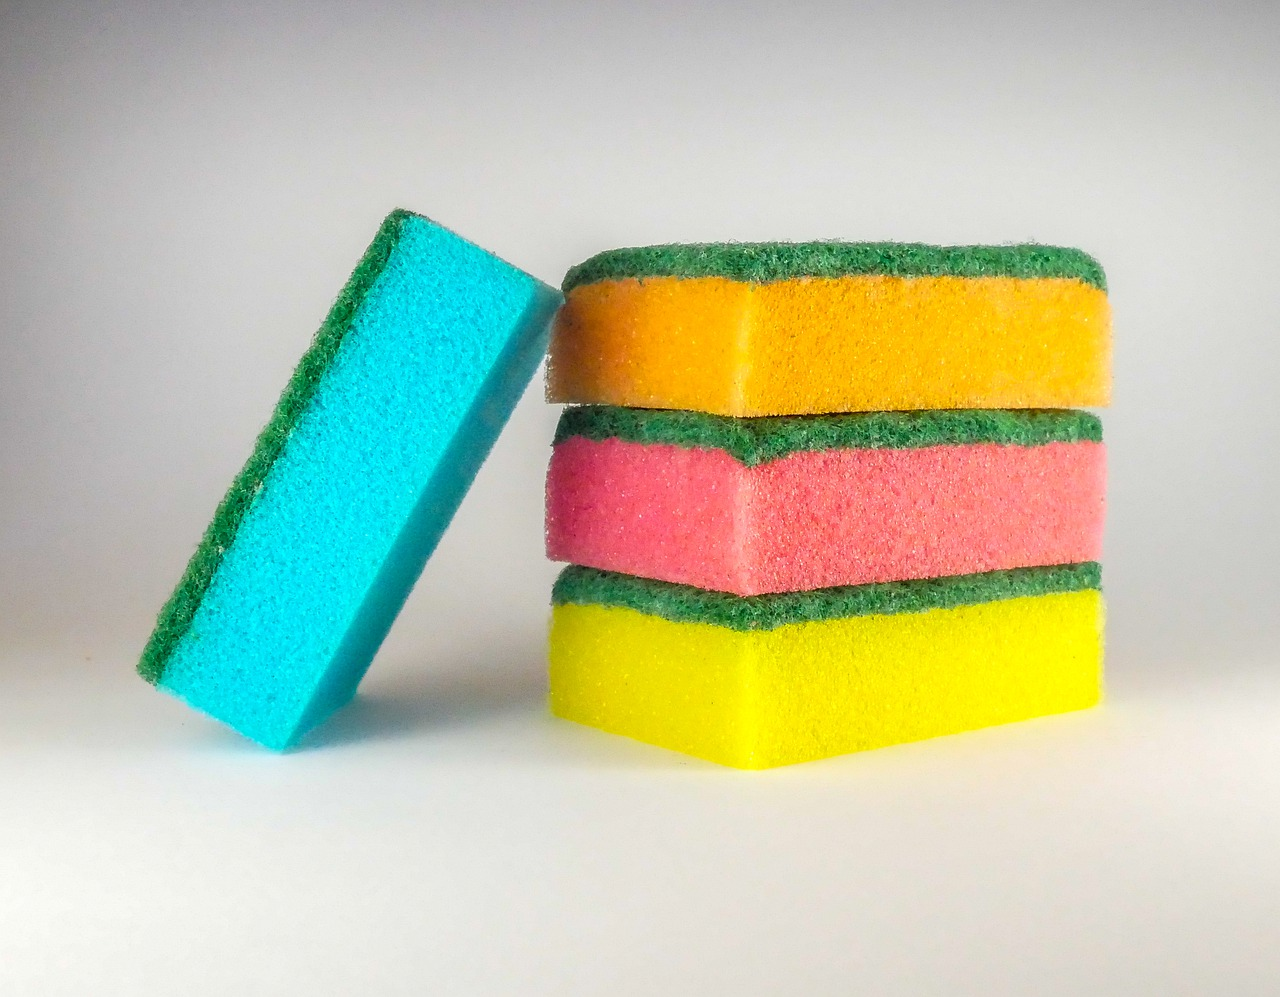 sponge-4501298_1280